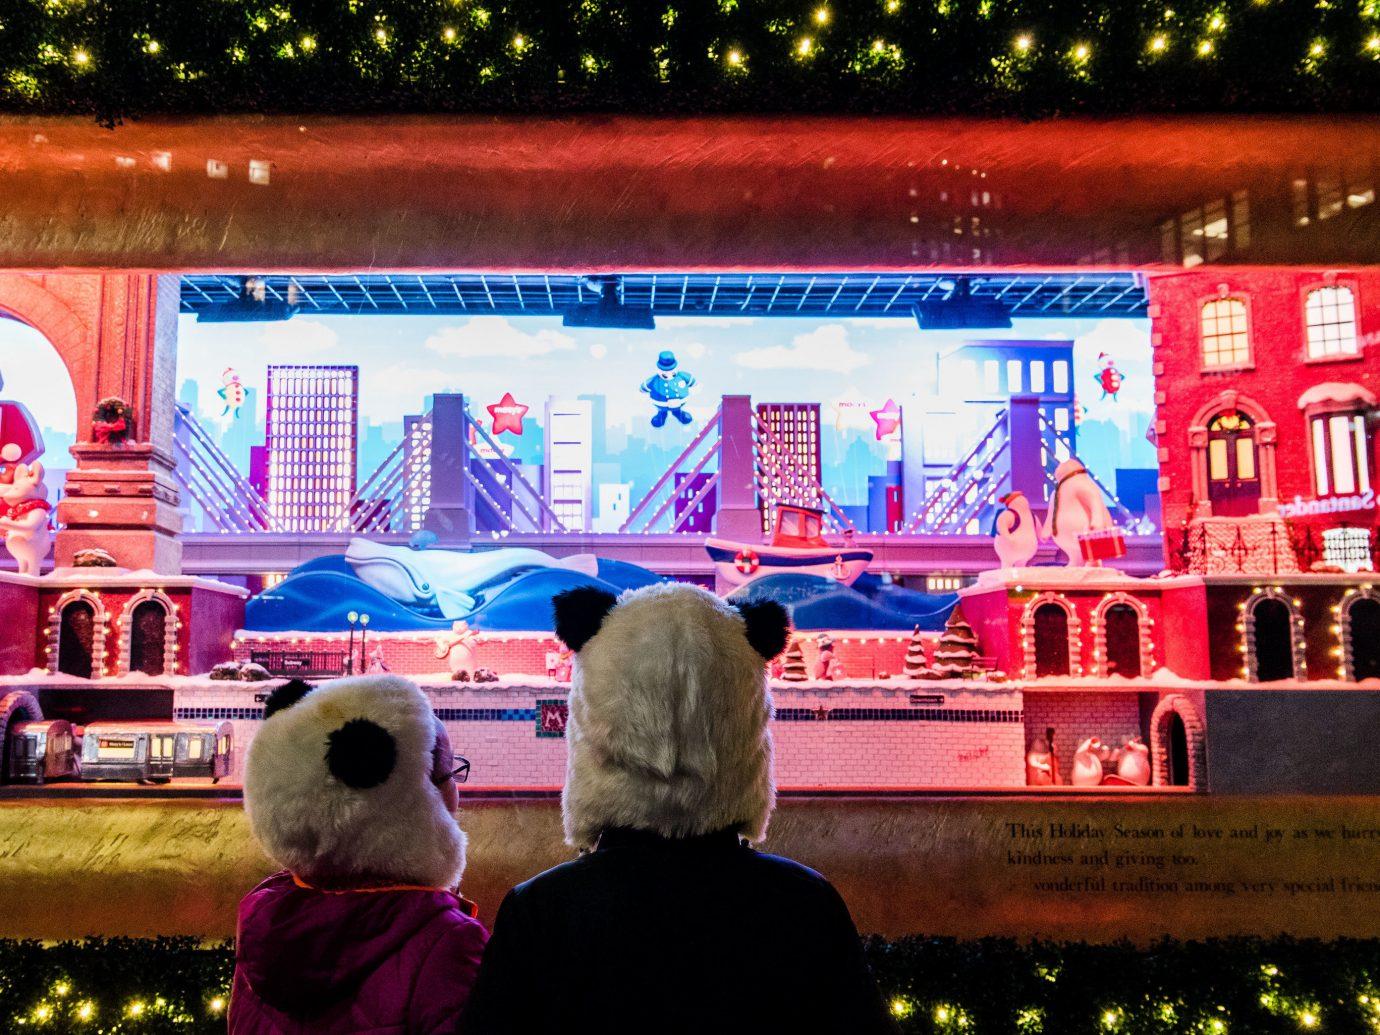 Offbeat Winter tree stage fun recreation festival City fête crowd night event